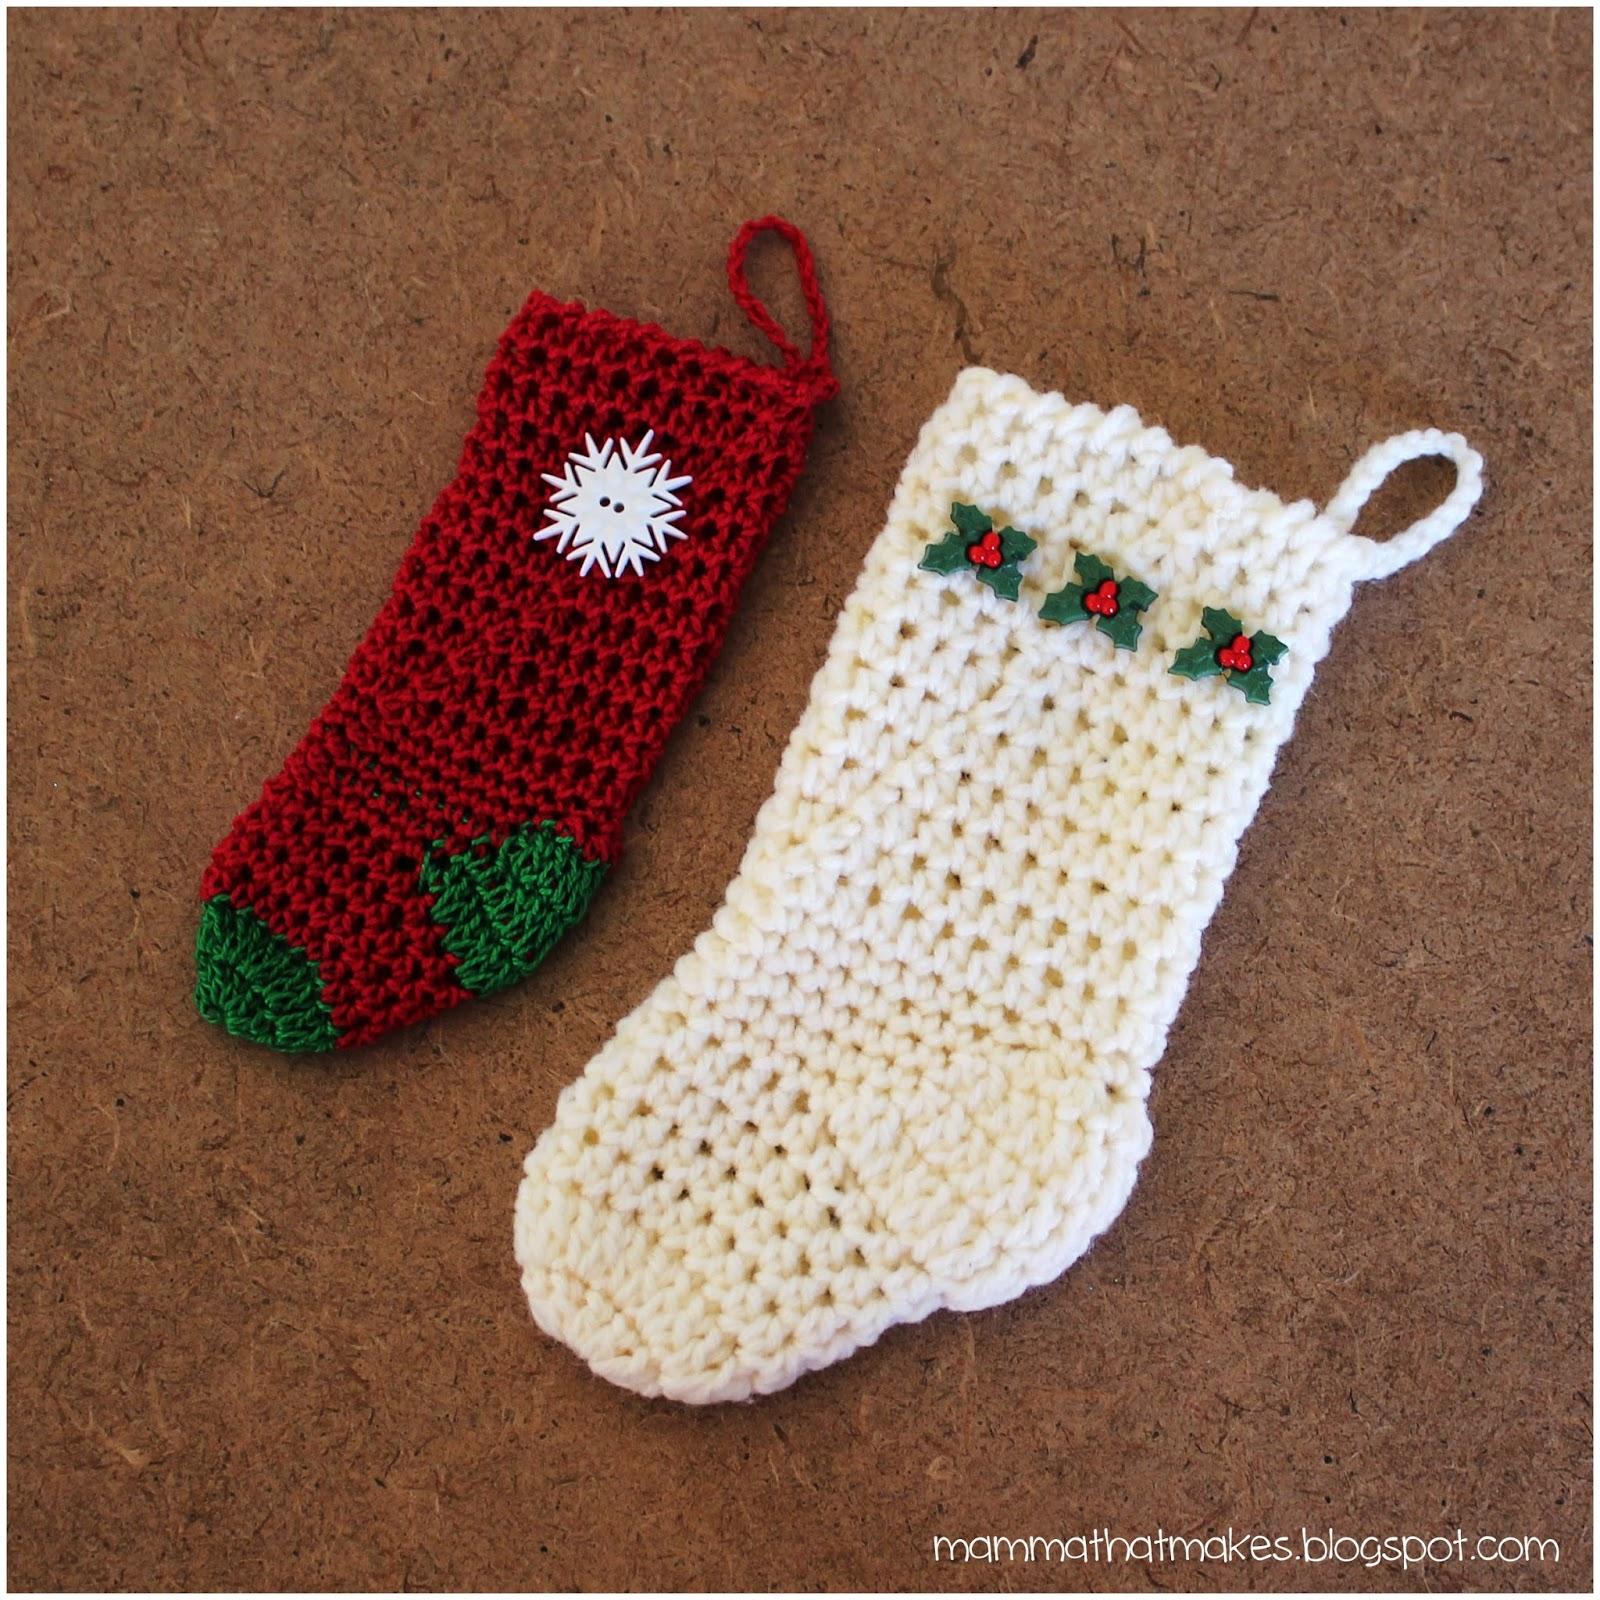 67cdae00c Mamma That Makes  Mini Crochet Christmas Stocking 2 Ways